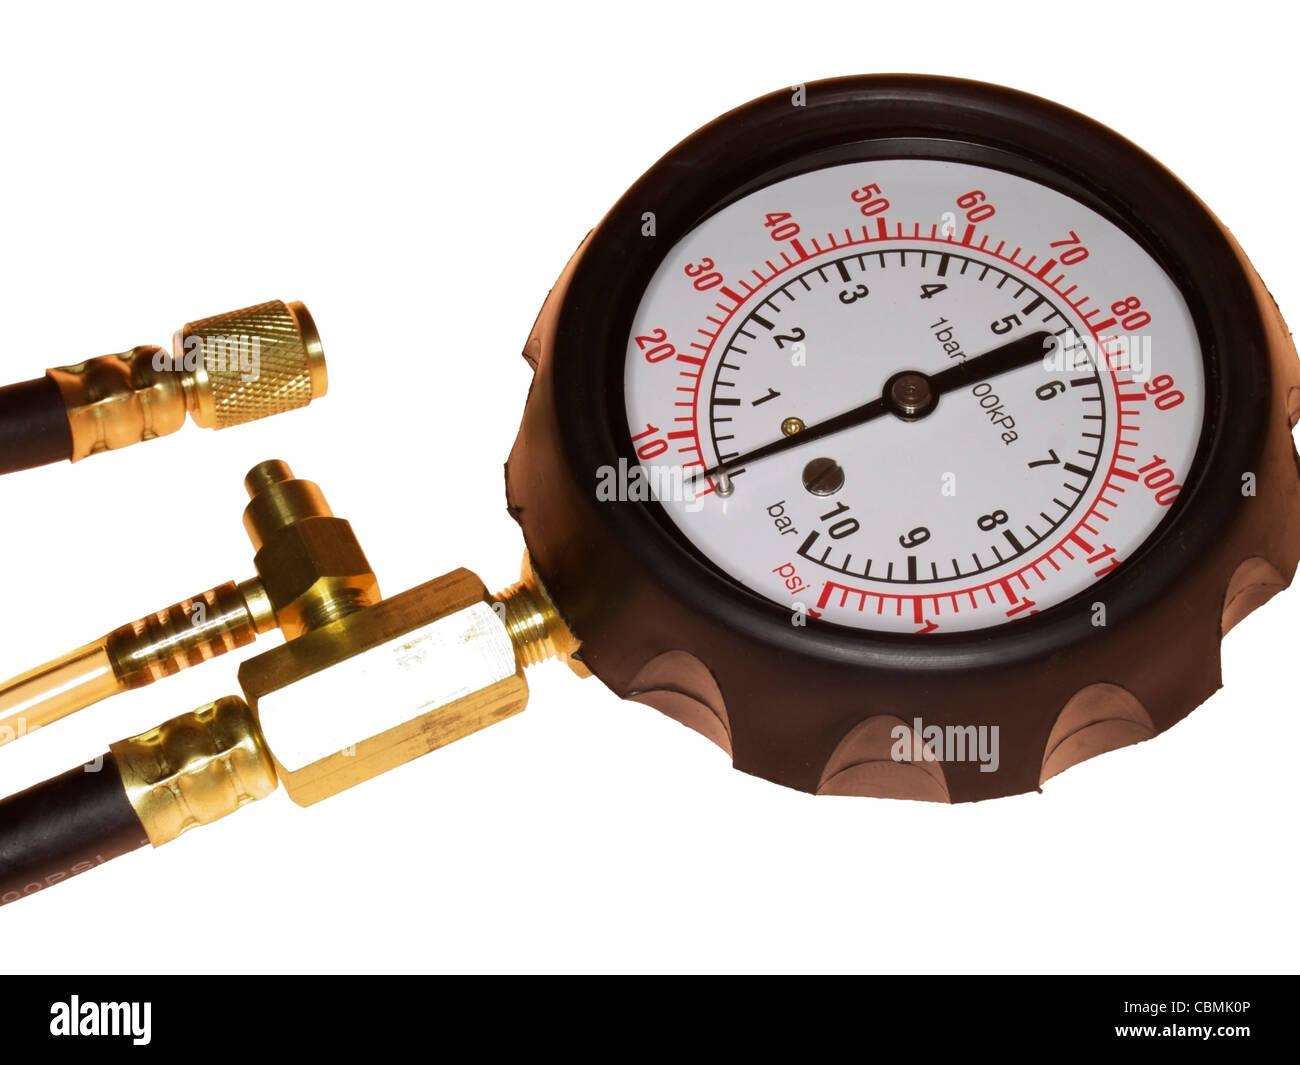 fuel pressure tester - Stock Image